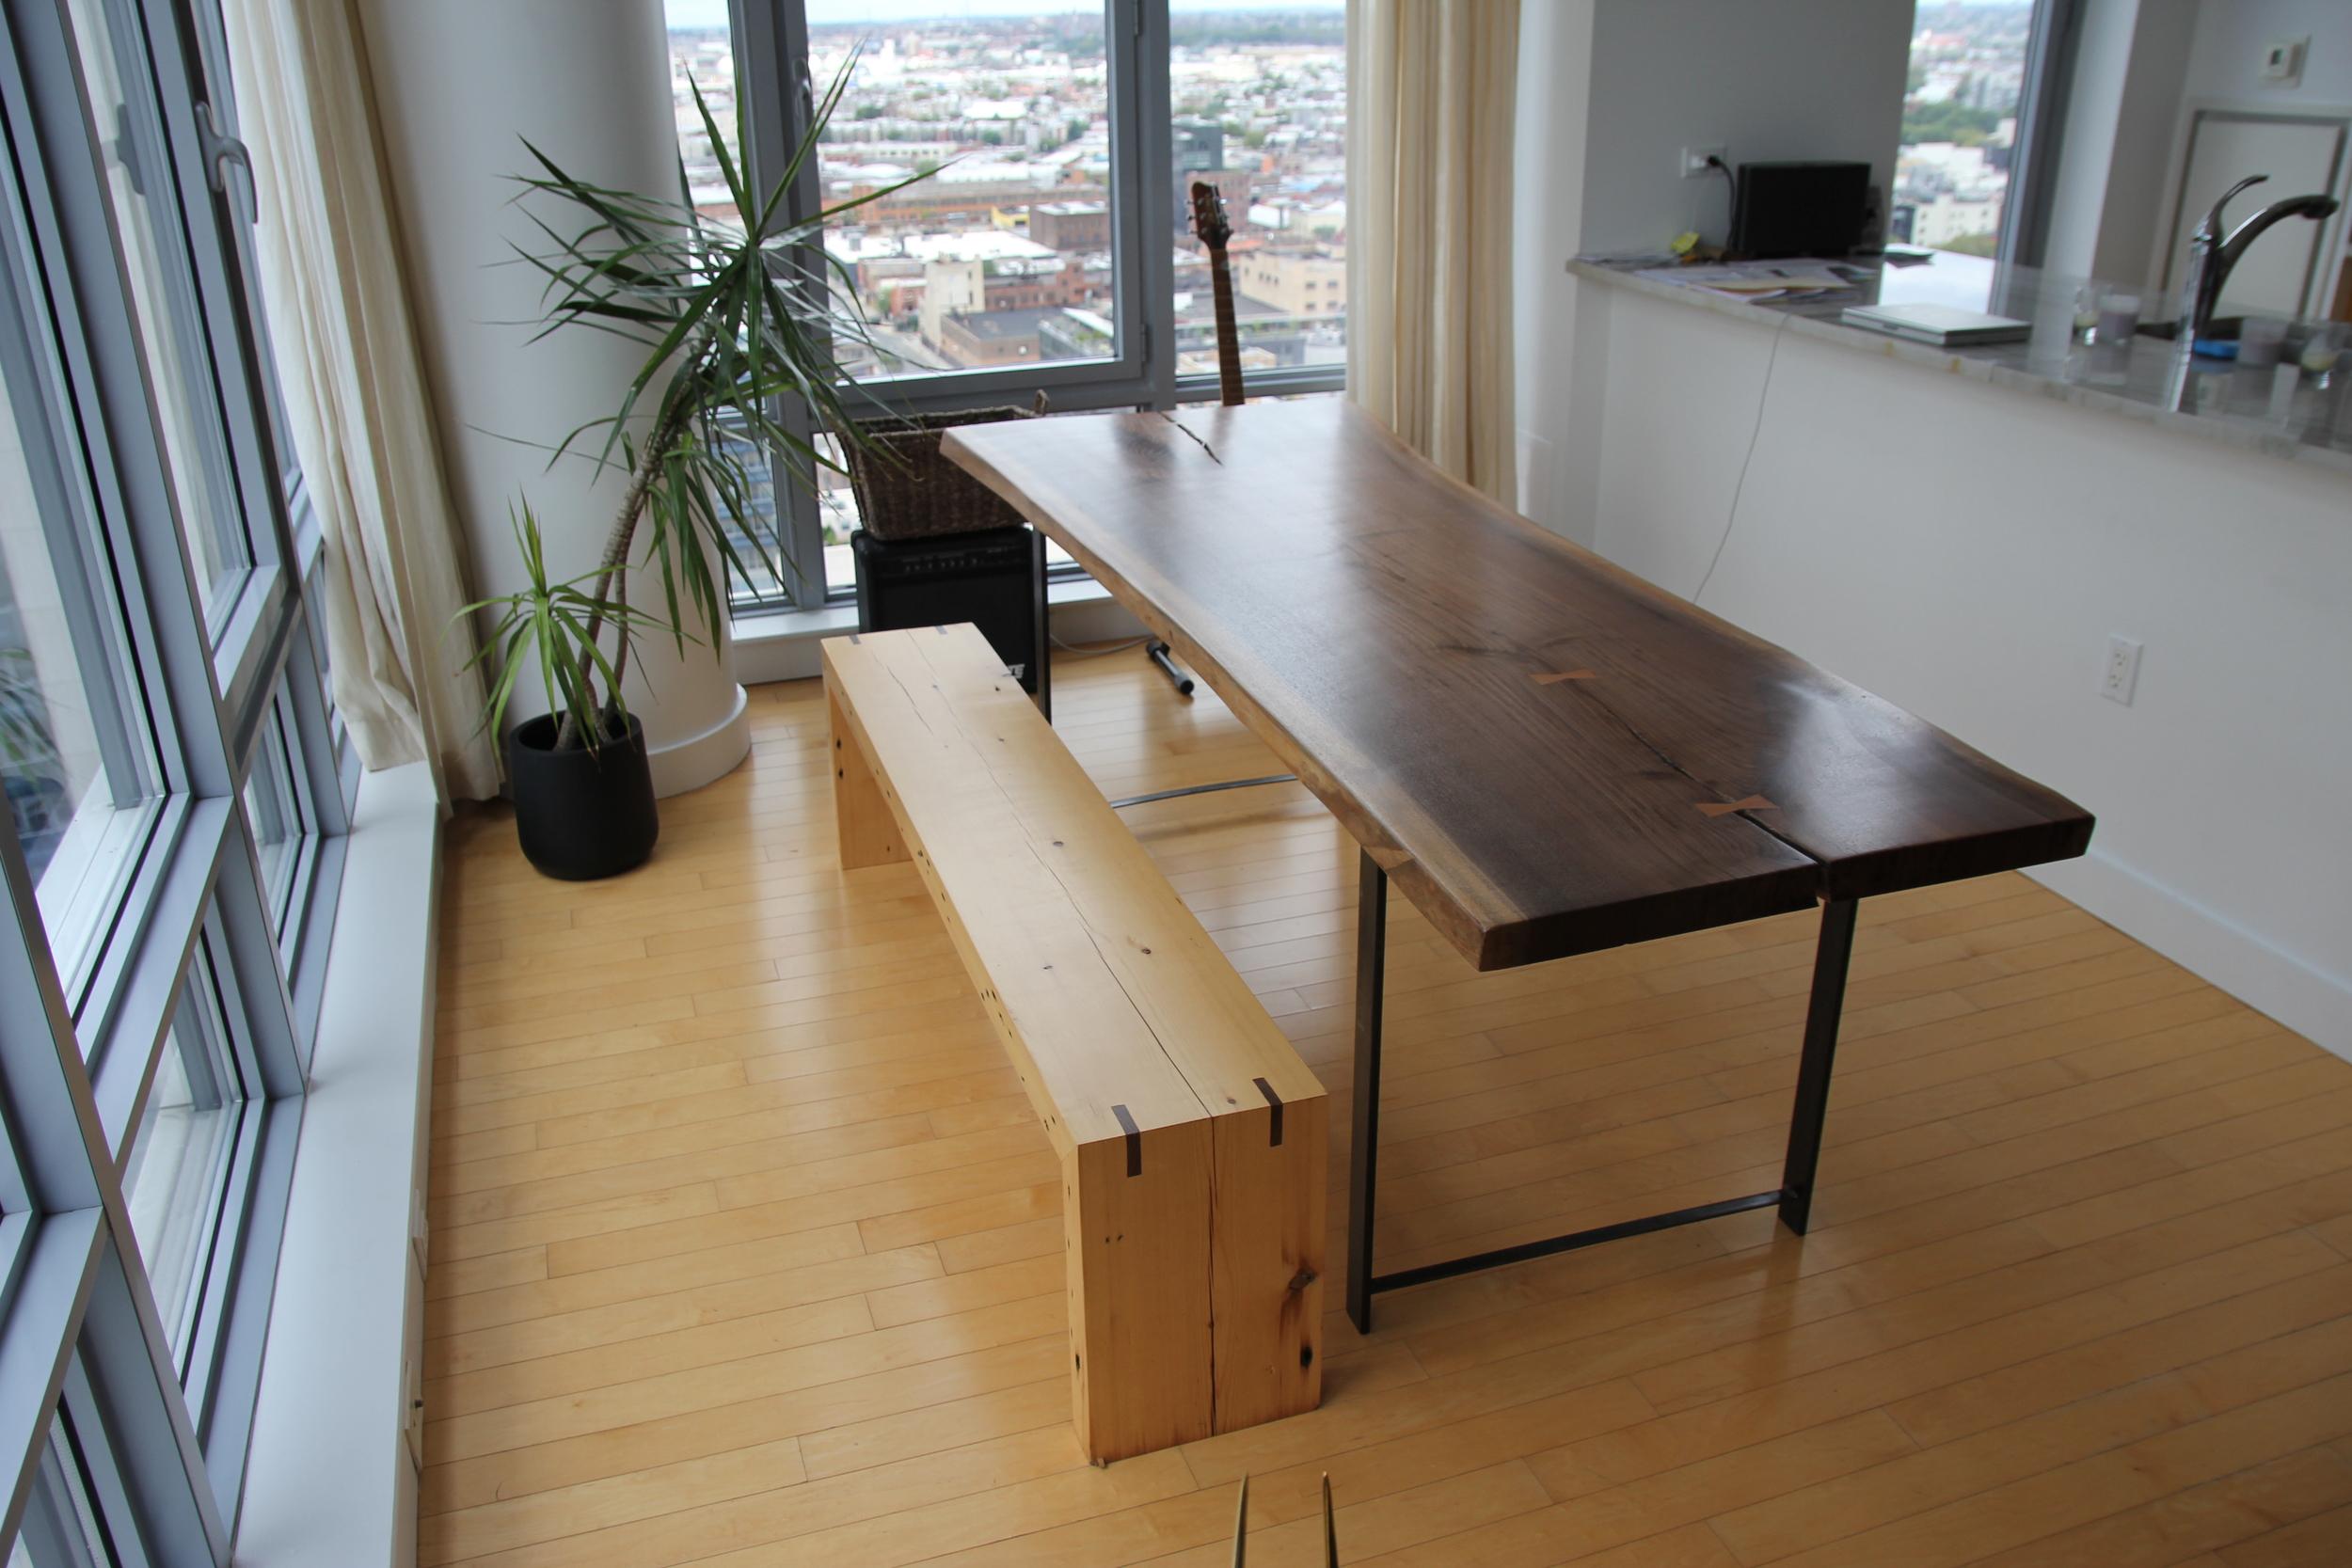 Walnut Table and Douglas Fir Bench